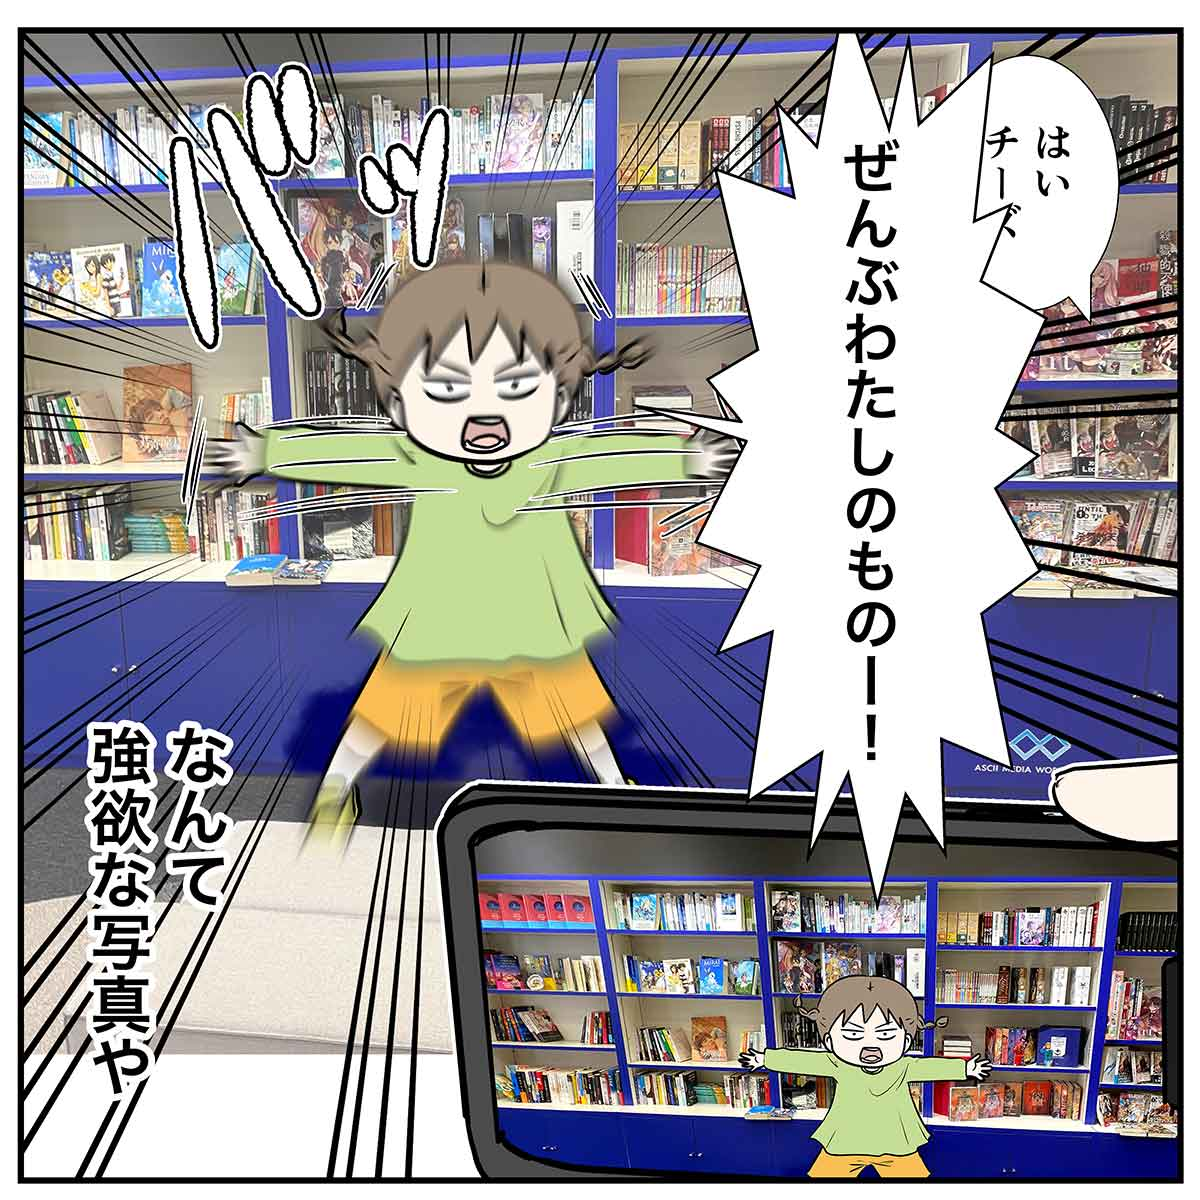 KADOKAWAには本がたくさんあった 東京への旅(11)